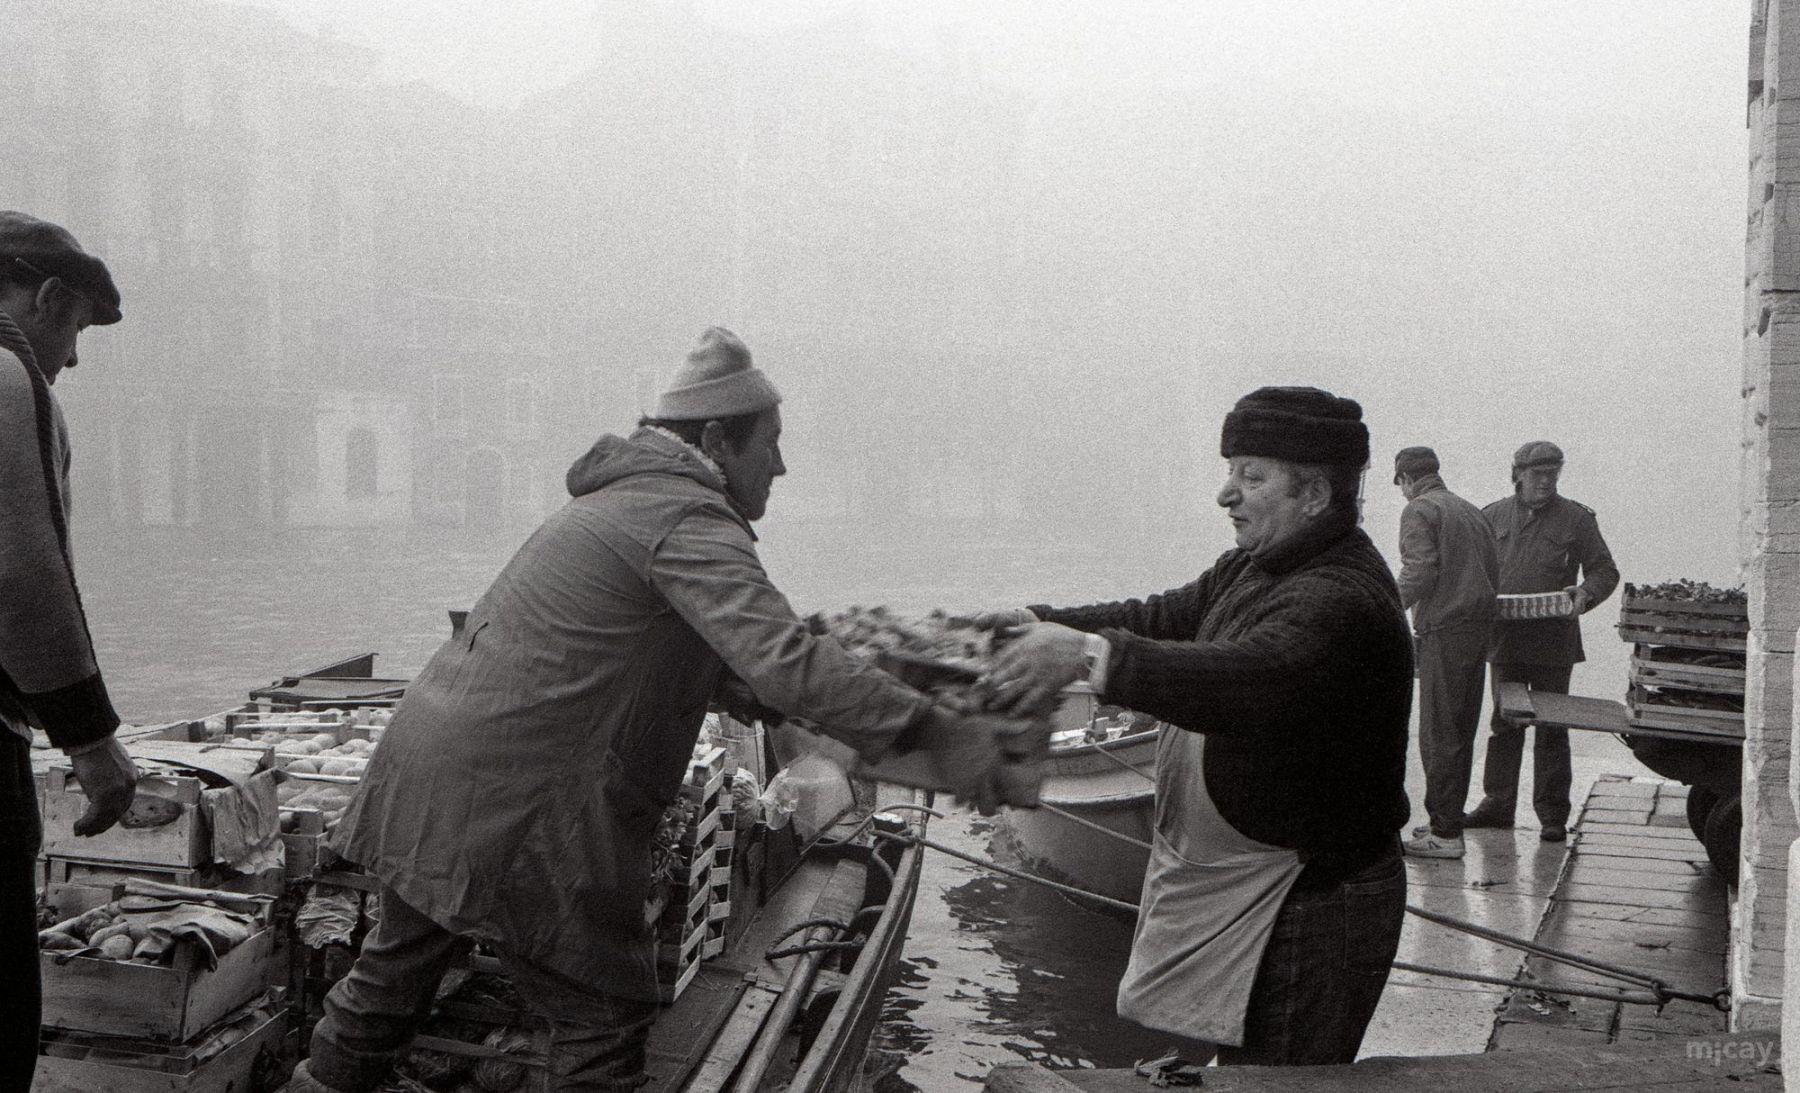 MichelAycaguer-Venise-AquaAlta-Noel-1981-9